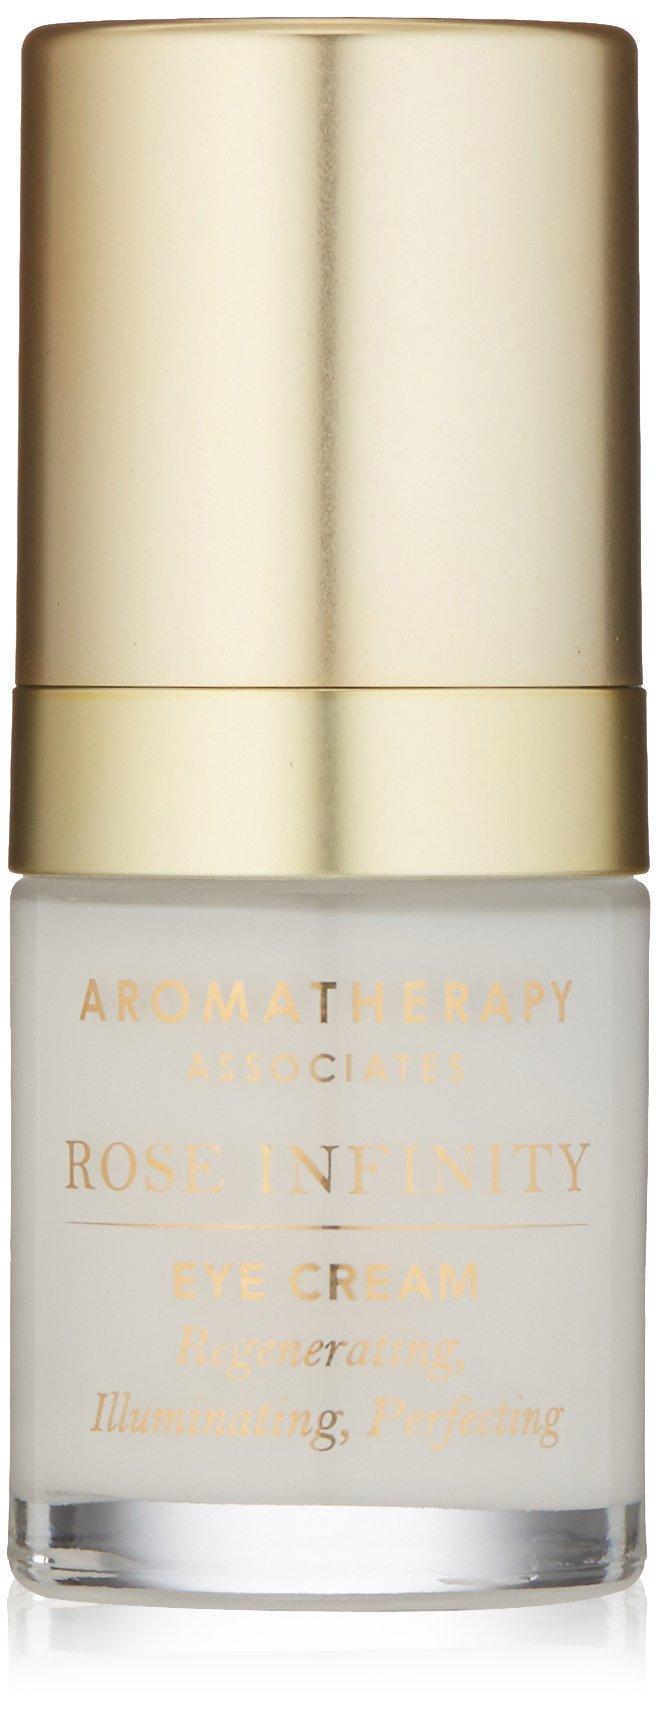 Aromatherapy Associates Rose Infinity Eye Cream, 0.5 fl.oz.